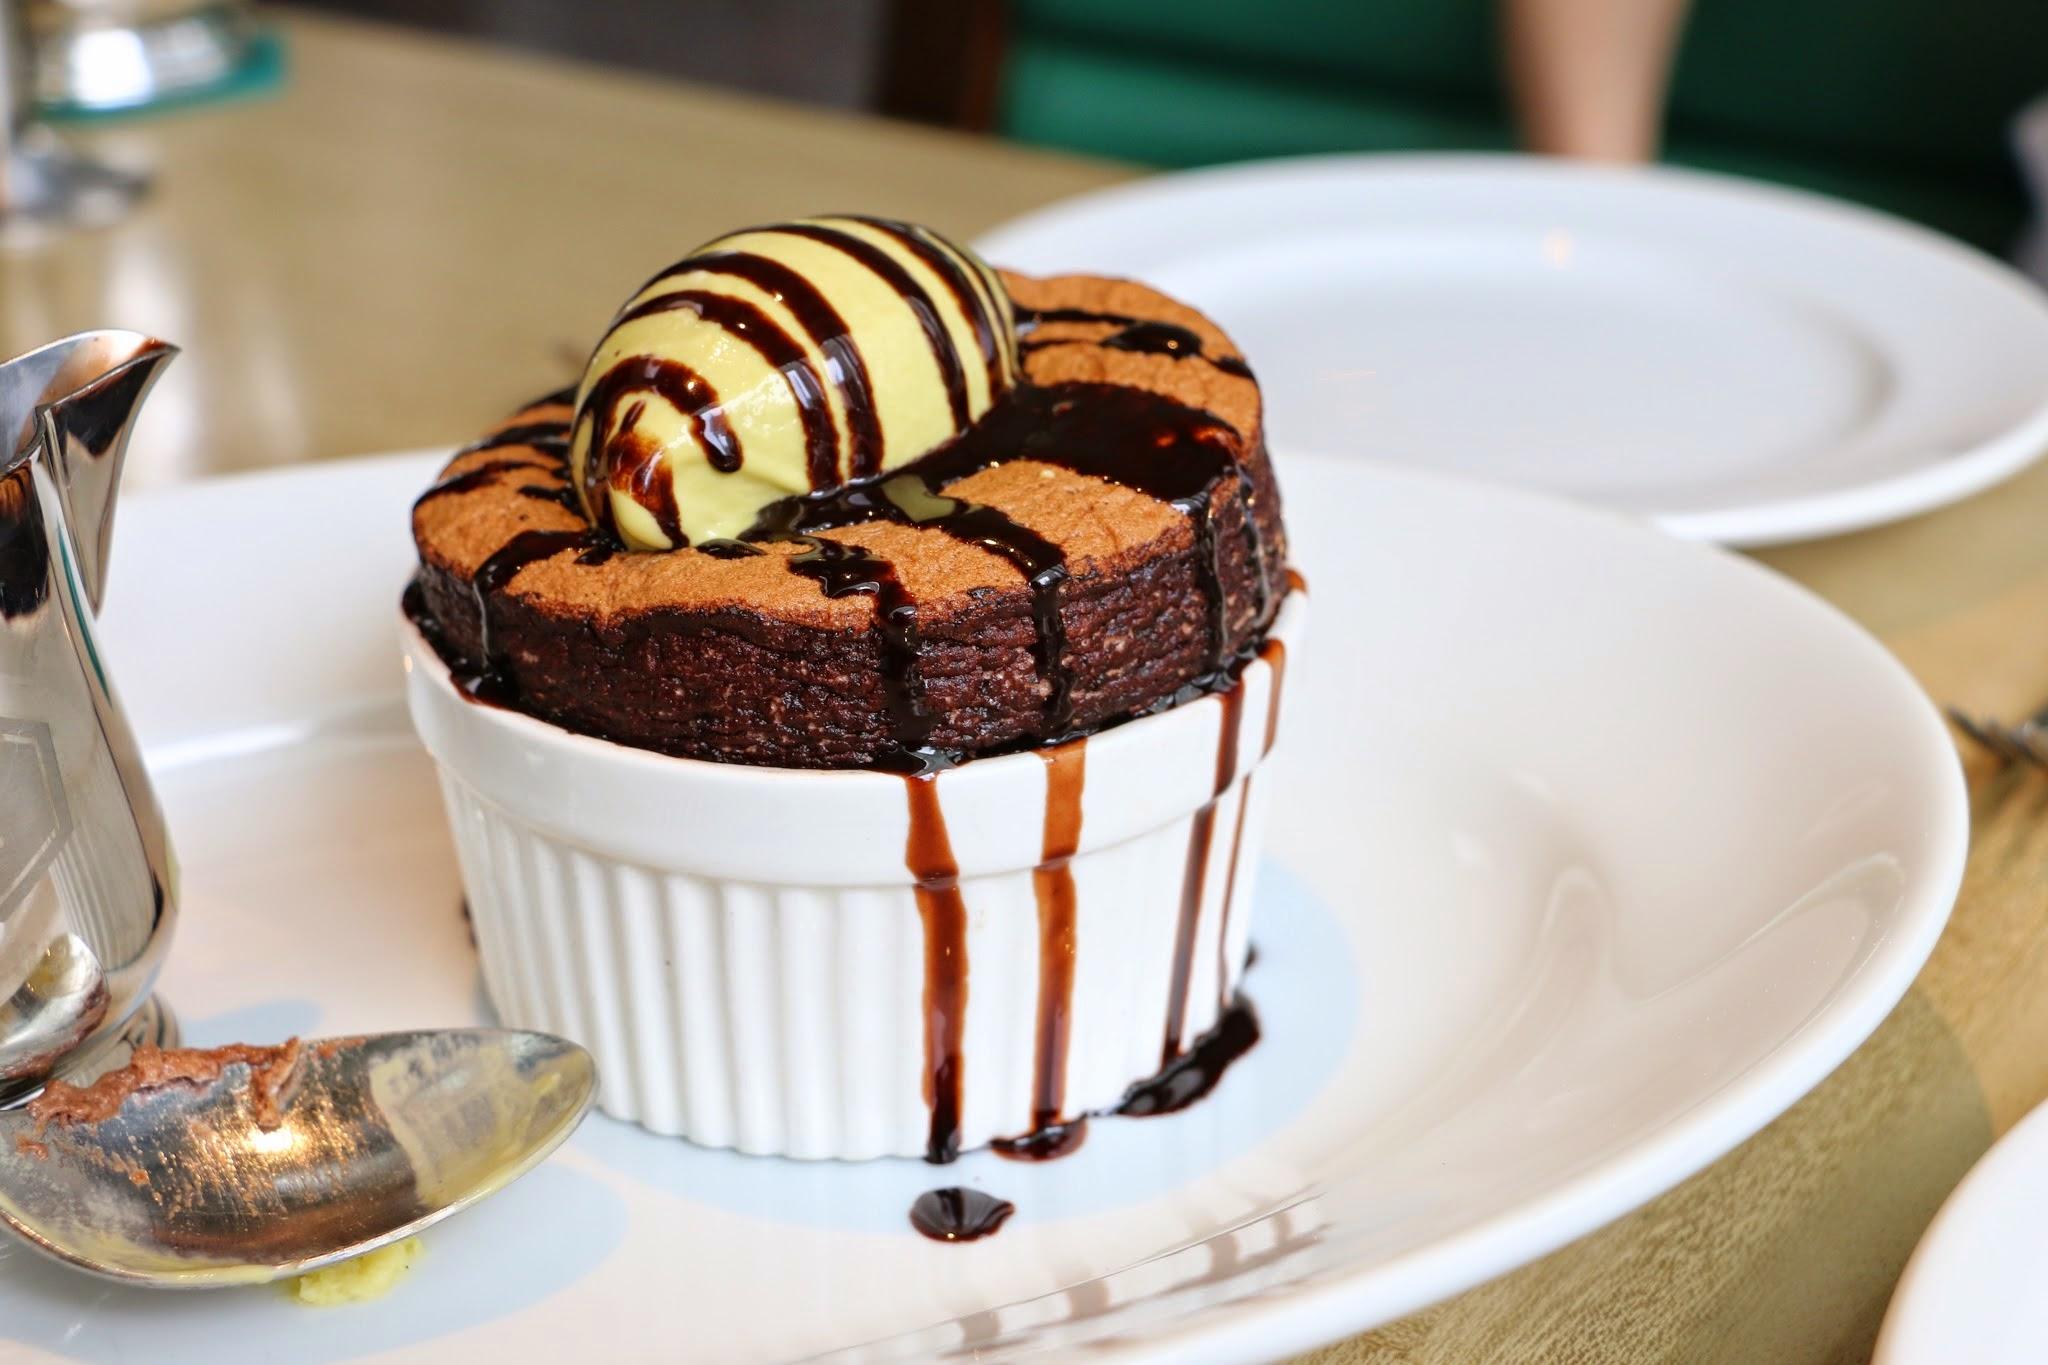 The Continental Chocolate Pistachio Souffle